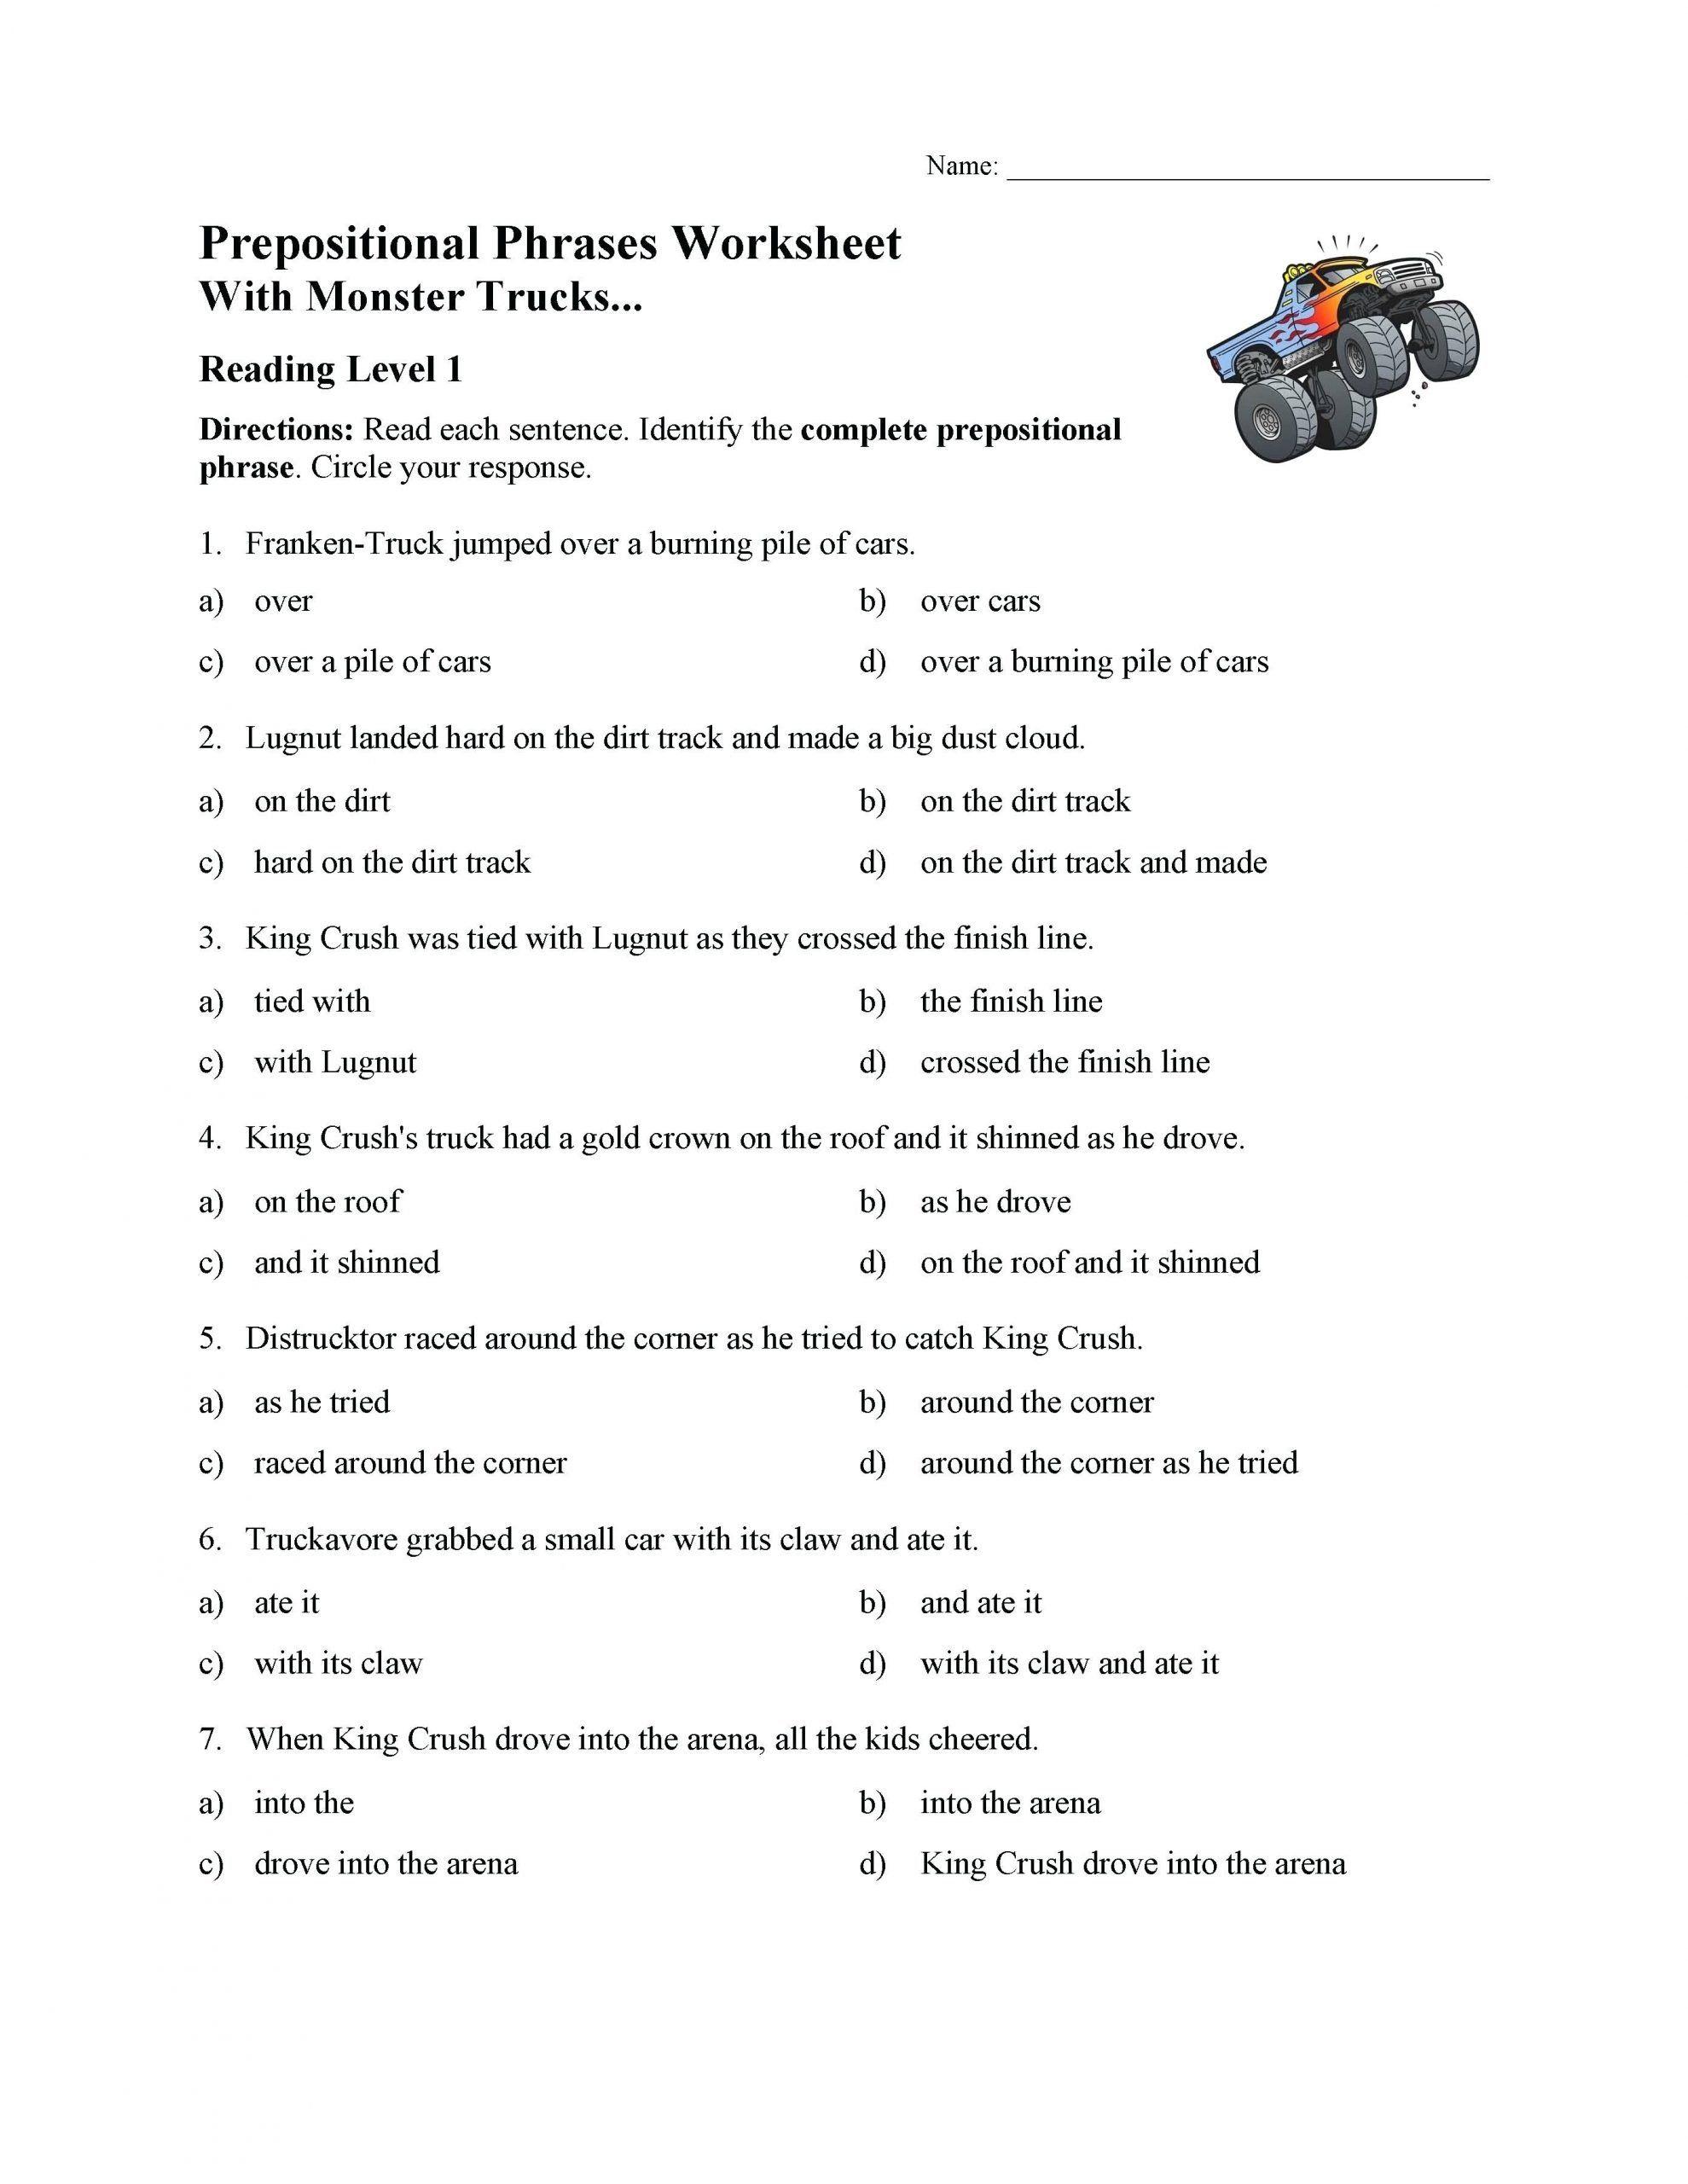 Preschool Worksheet Packet Fifth Grade Reading